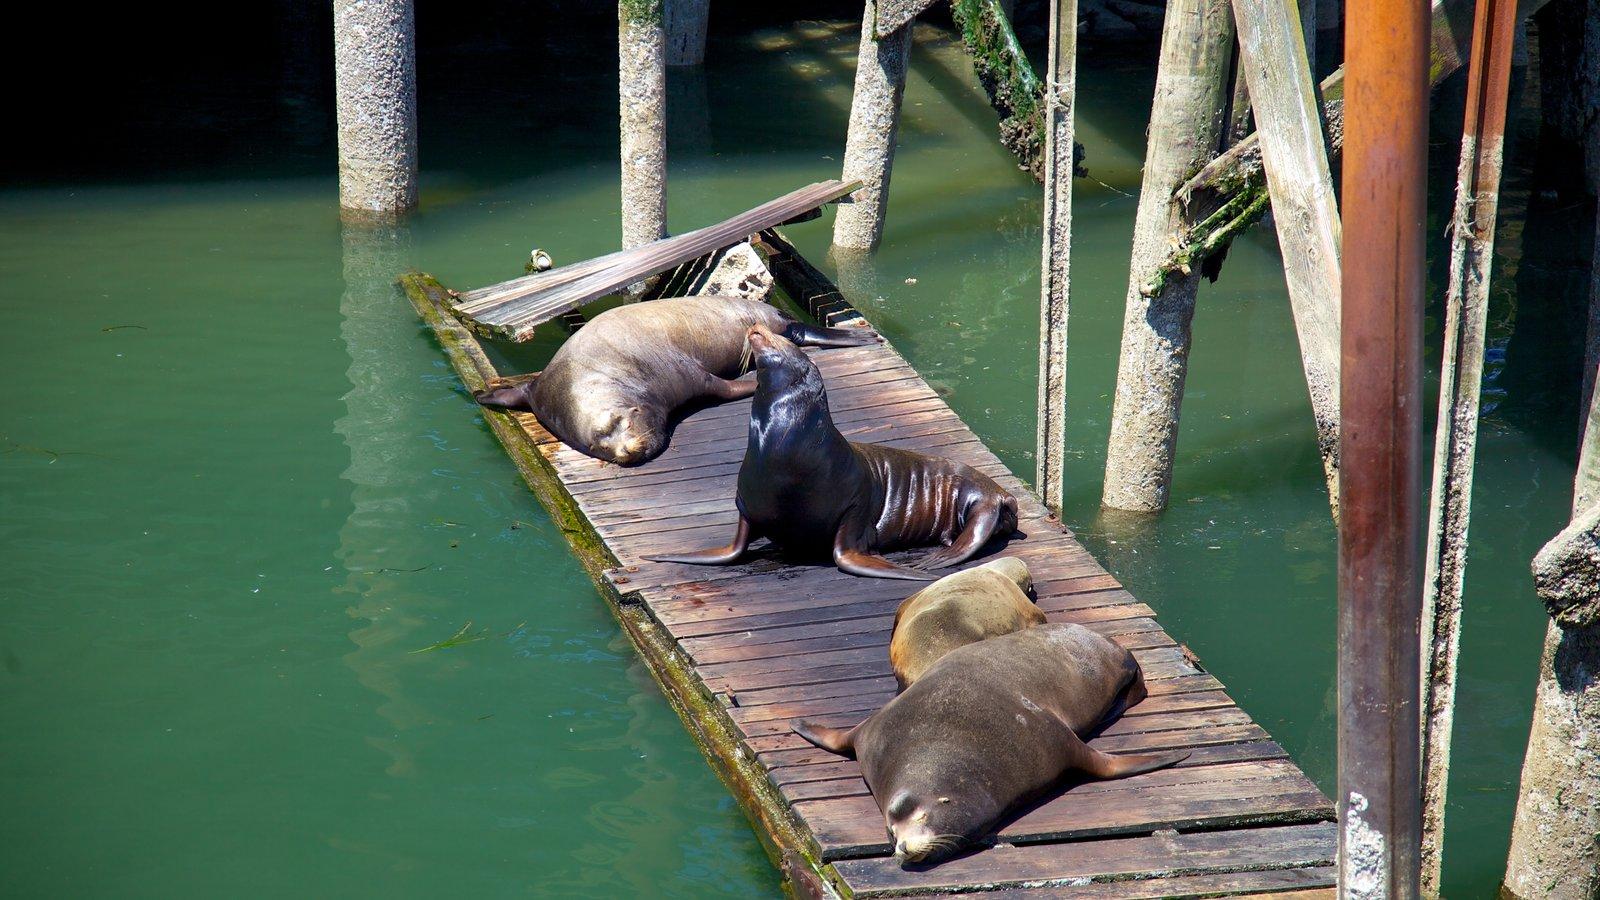 Newport featuring marine life, general coastal views and zoo animals